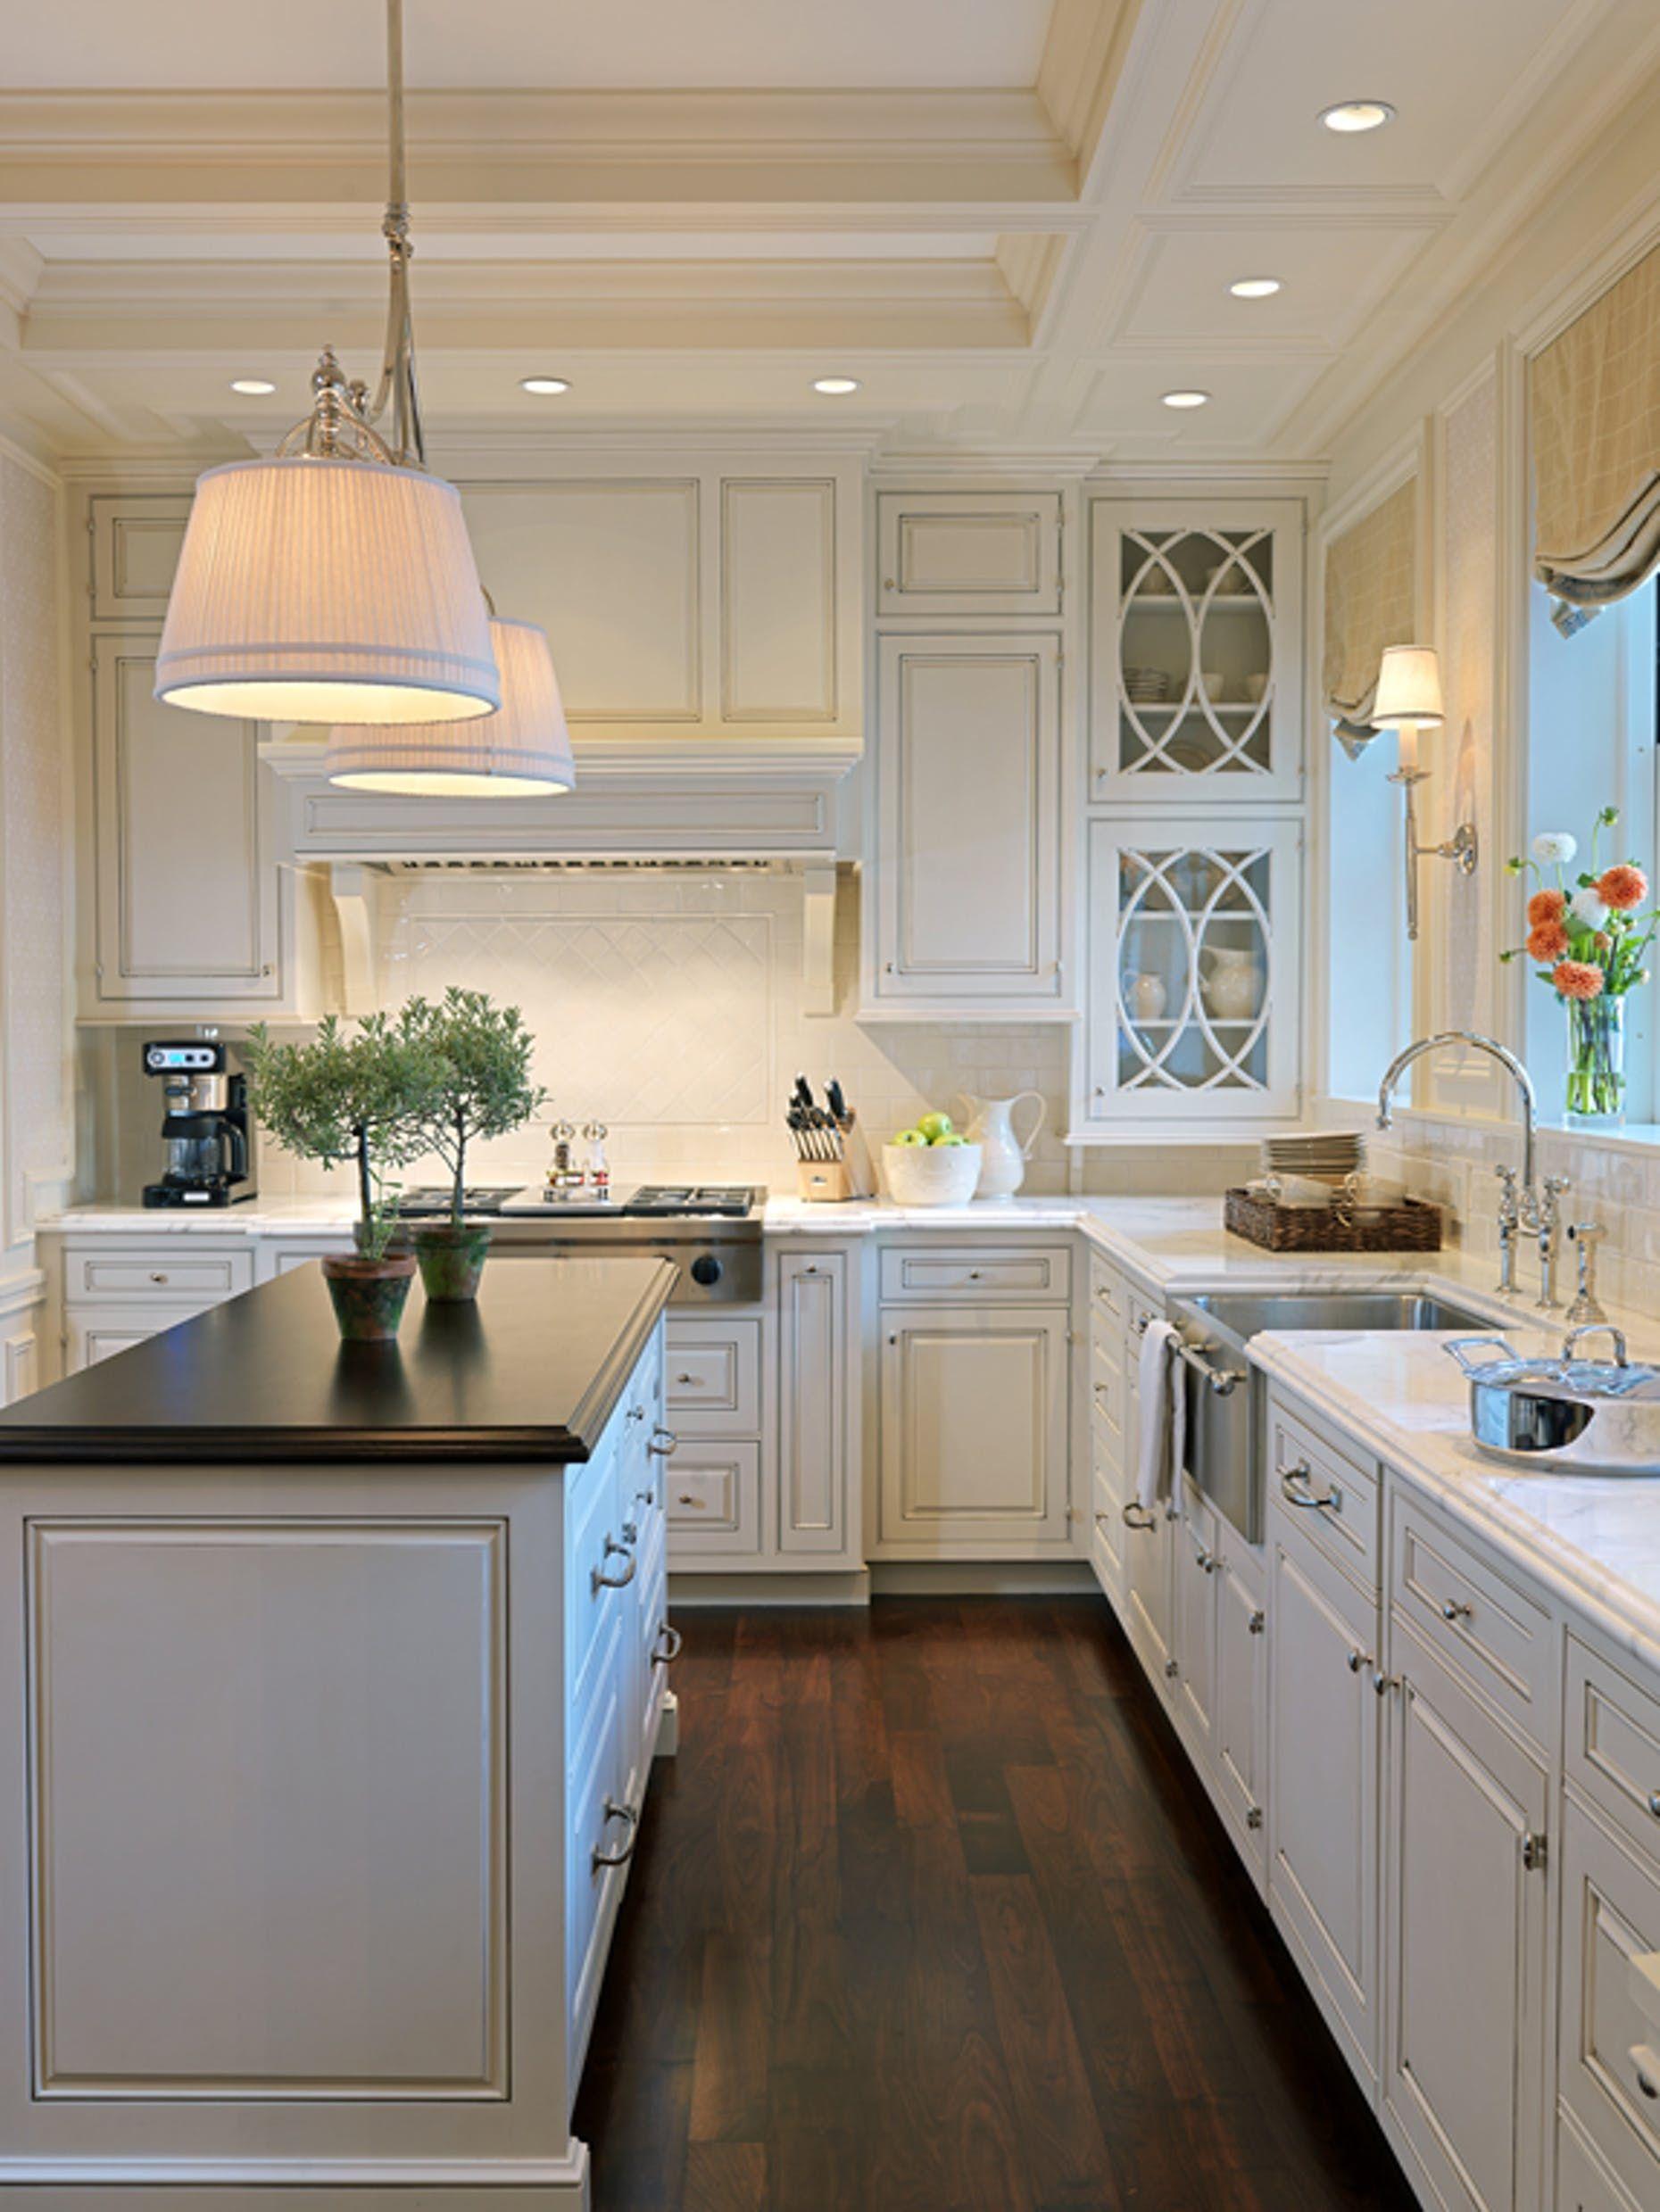 Wells fox portfolio interiors traditional american country kitchen ...